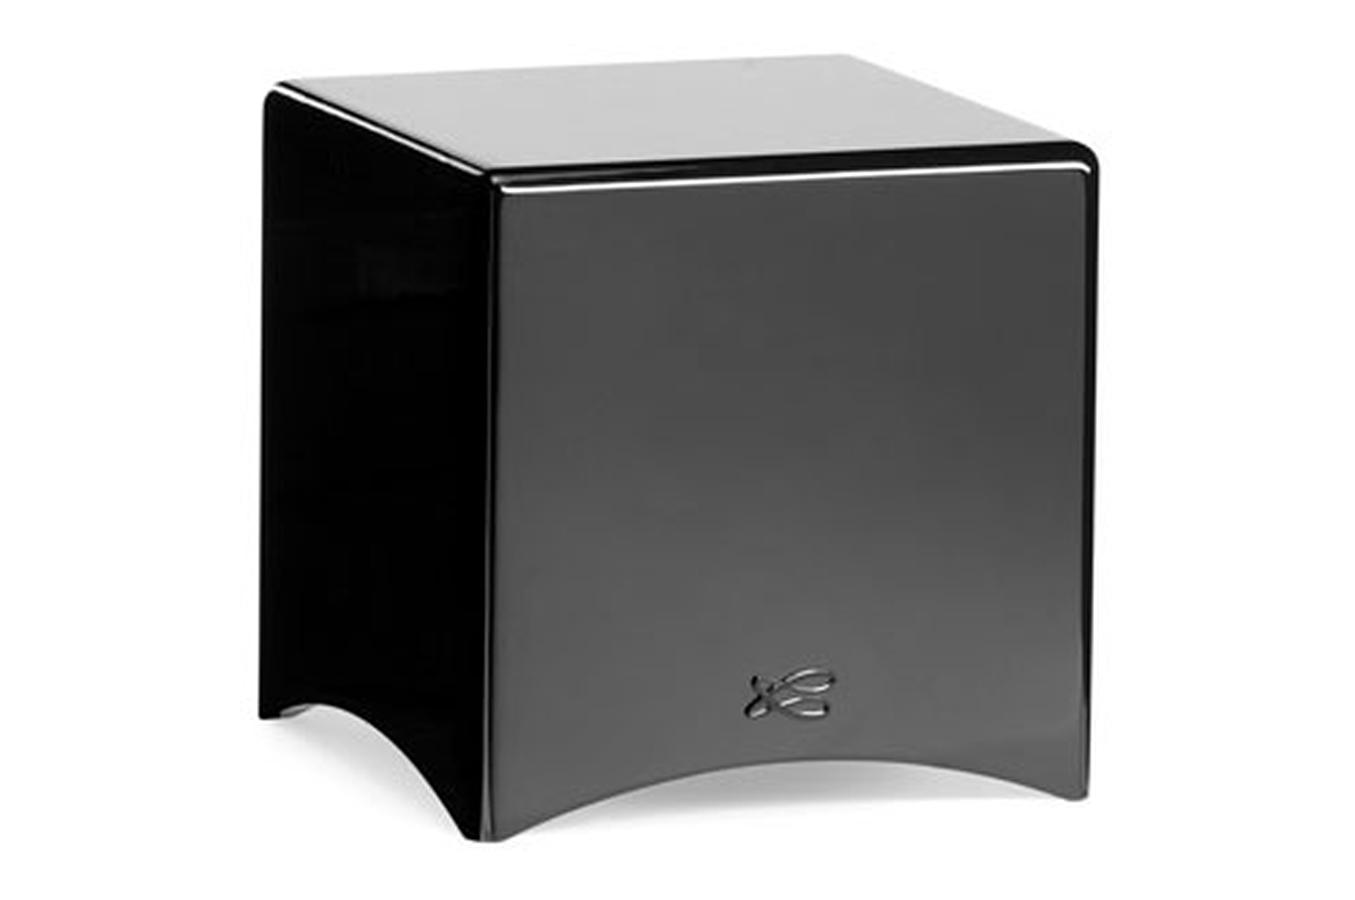 caisson de basses cabasse santorin 21 noir 2816881 darty. Black Bedroom Furniture Sets. Home Design Ideas